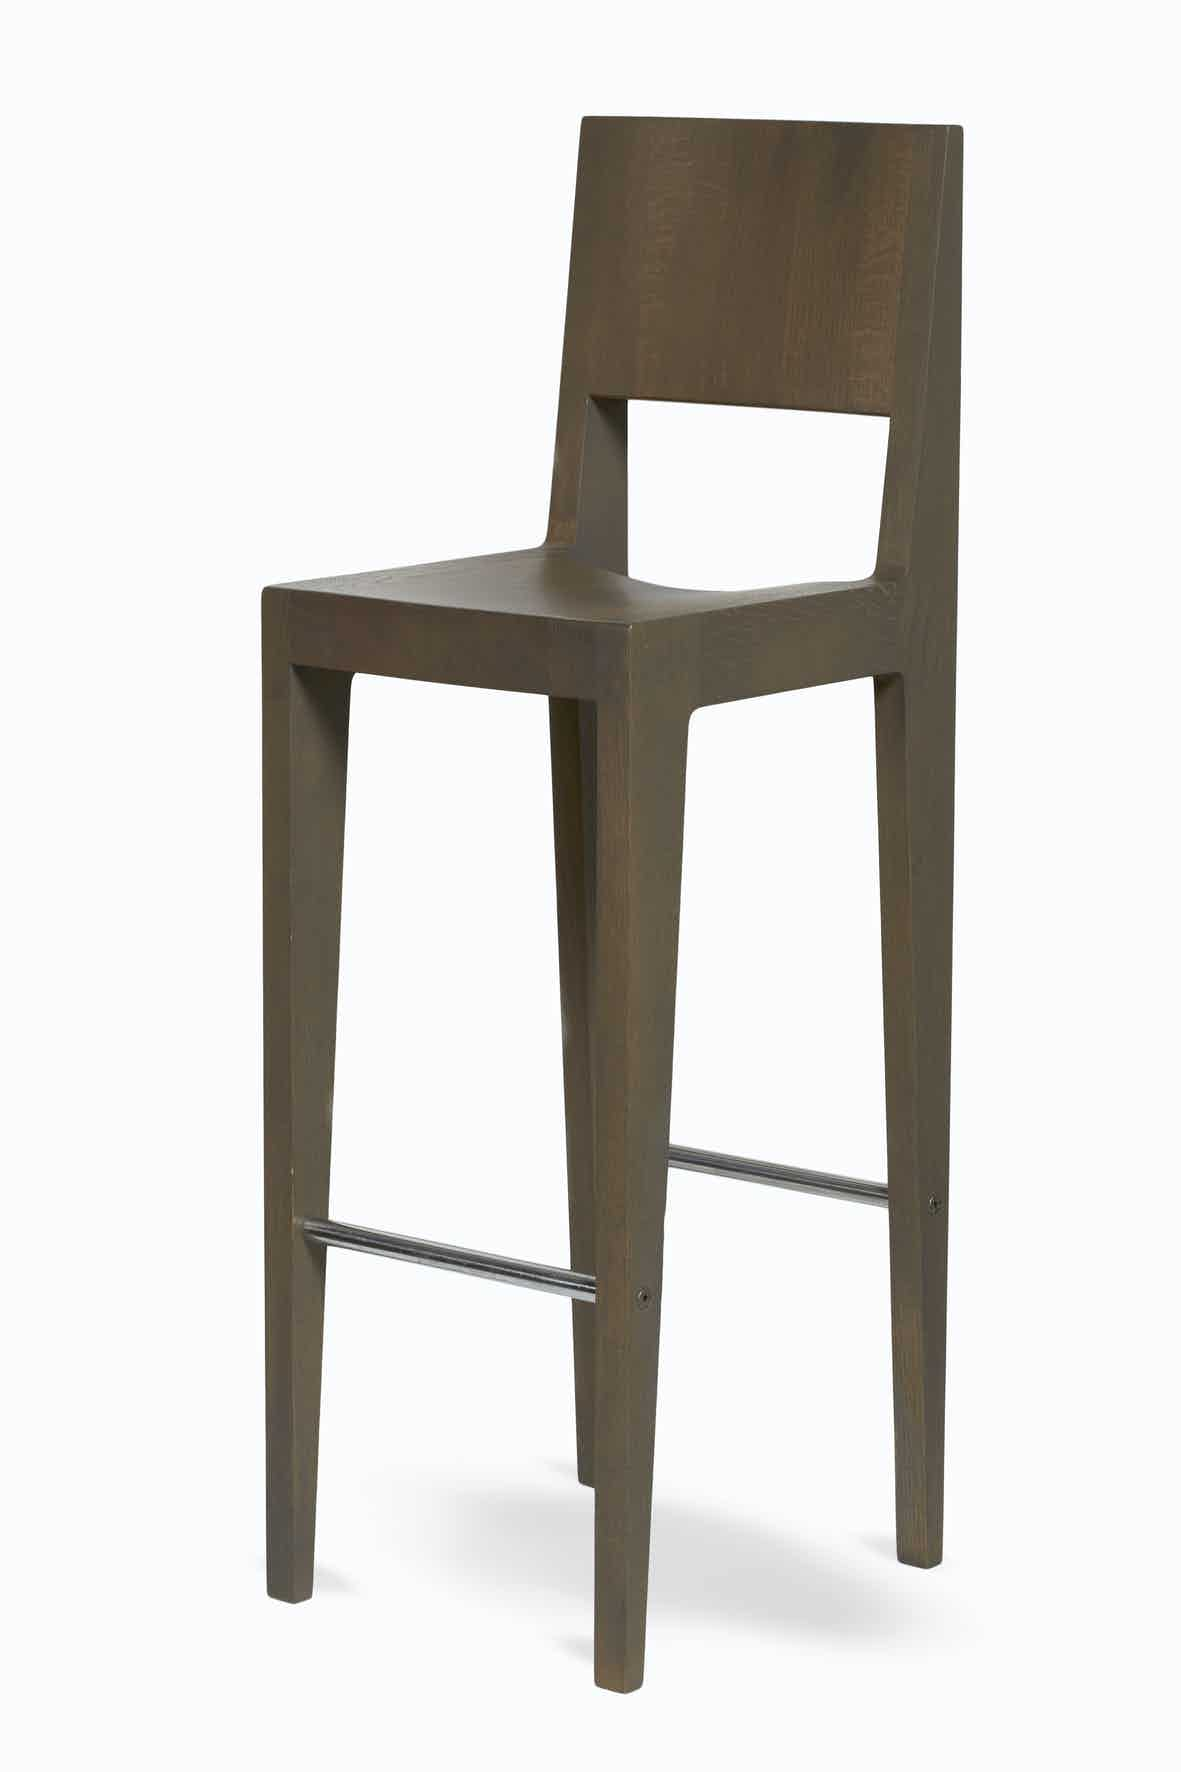 Spectrum Furniture Oak Clay Front Toos Stool Haute Living